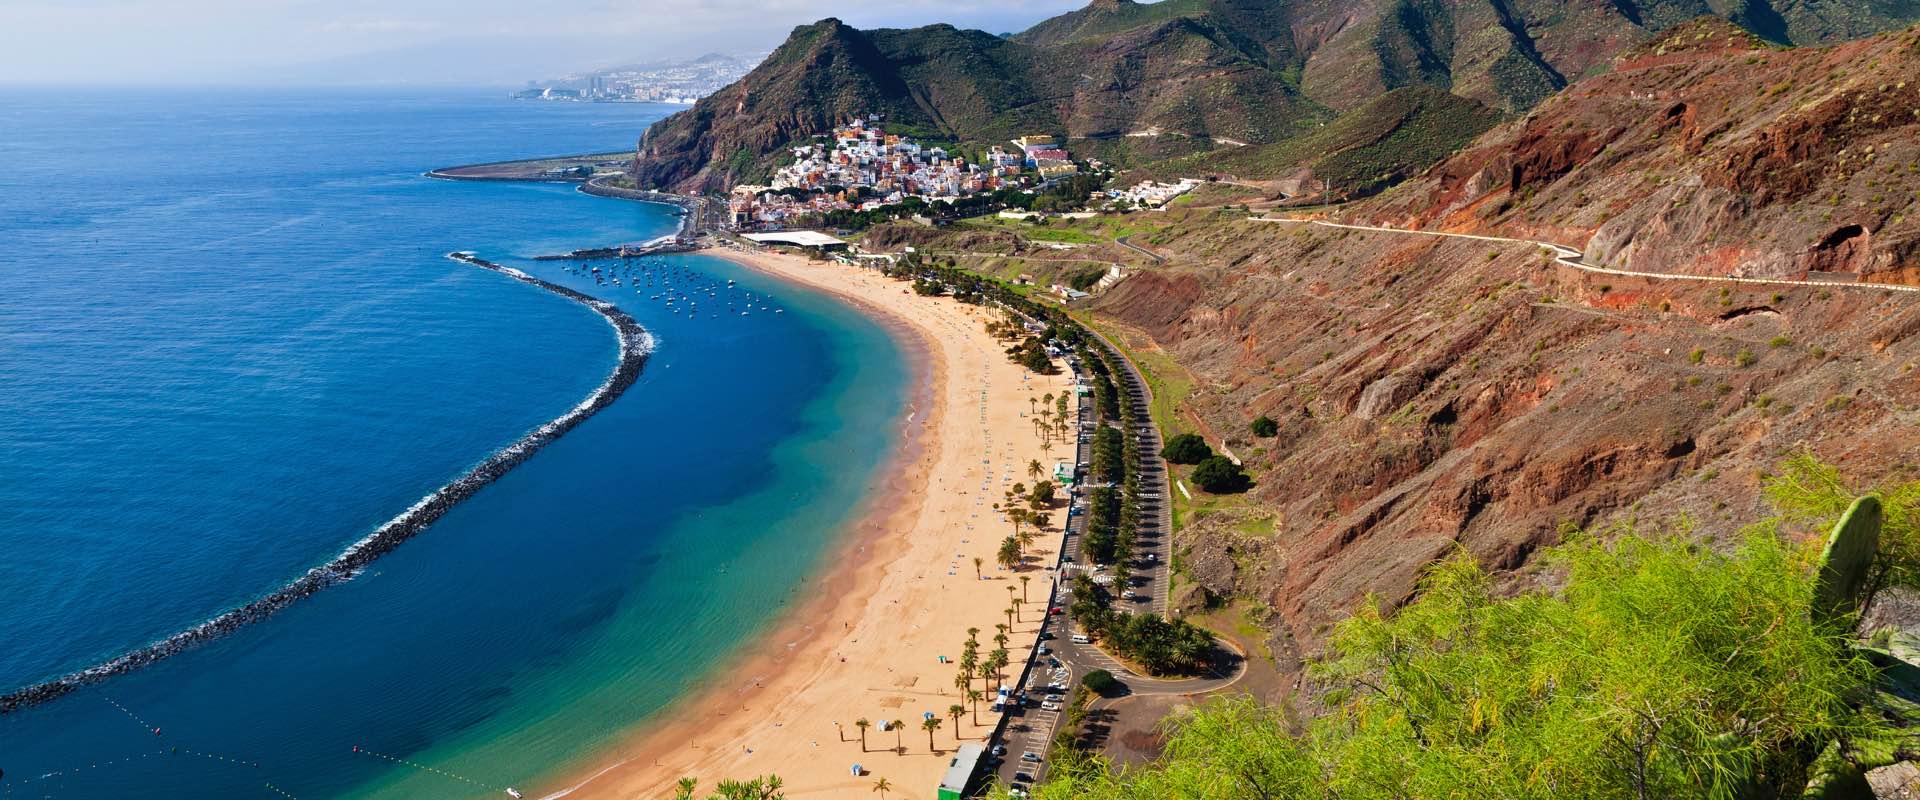 Aeroporto Tenerife Sud : Voli low cost per tenerife spagna da 50u20ac offerte edreams